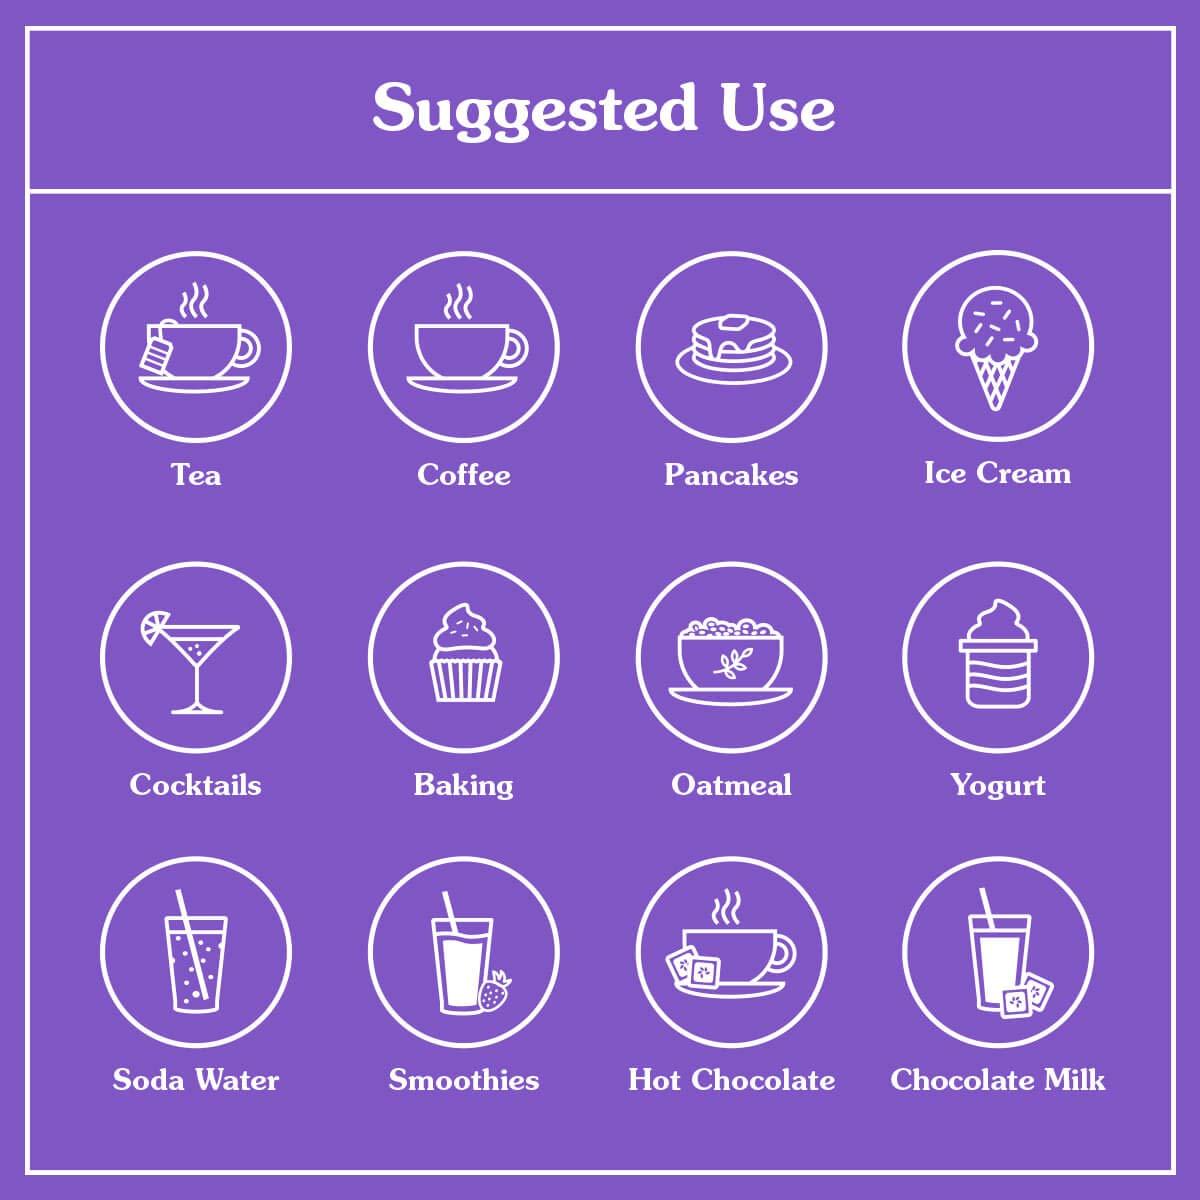 NuNaturals NoCarb Blend Powder All Purpose Natural Sweetener, Sugar-Free, Zero Calorie, (1,000 Packets) by NuNaturals (Image #3)